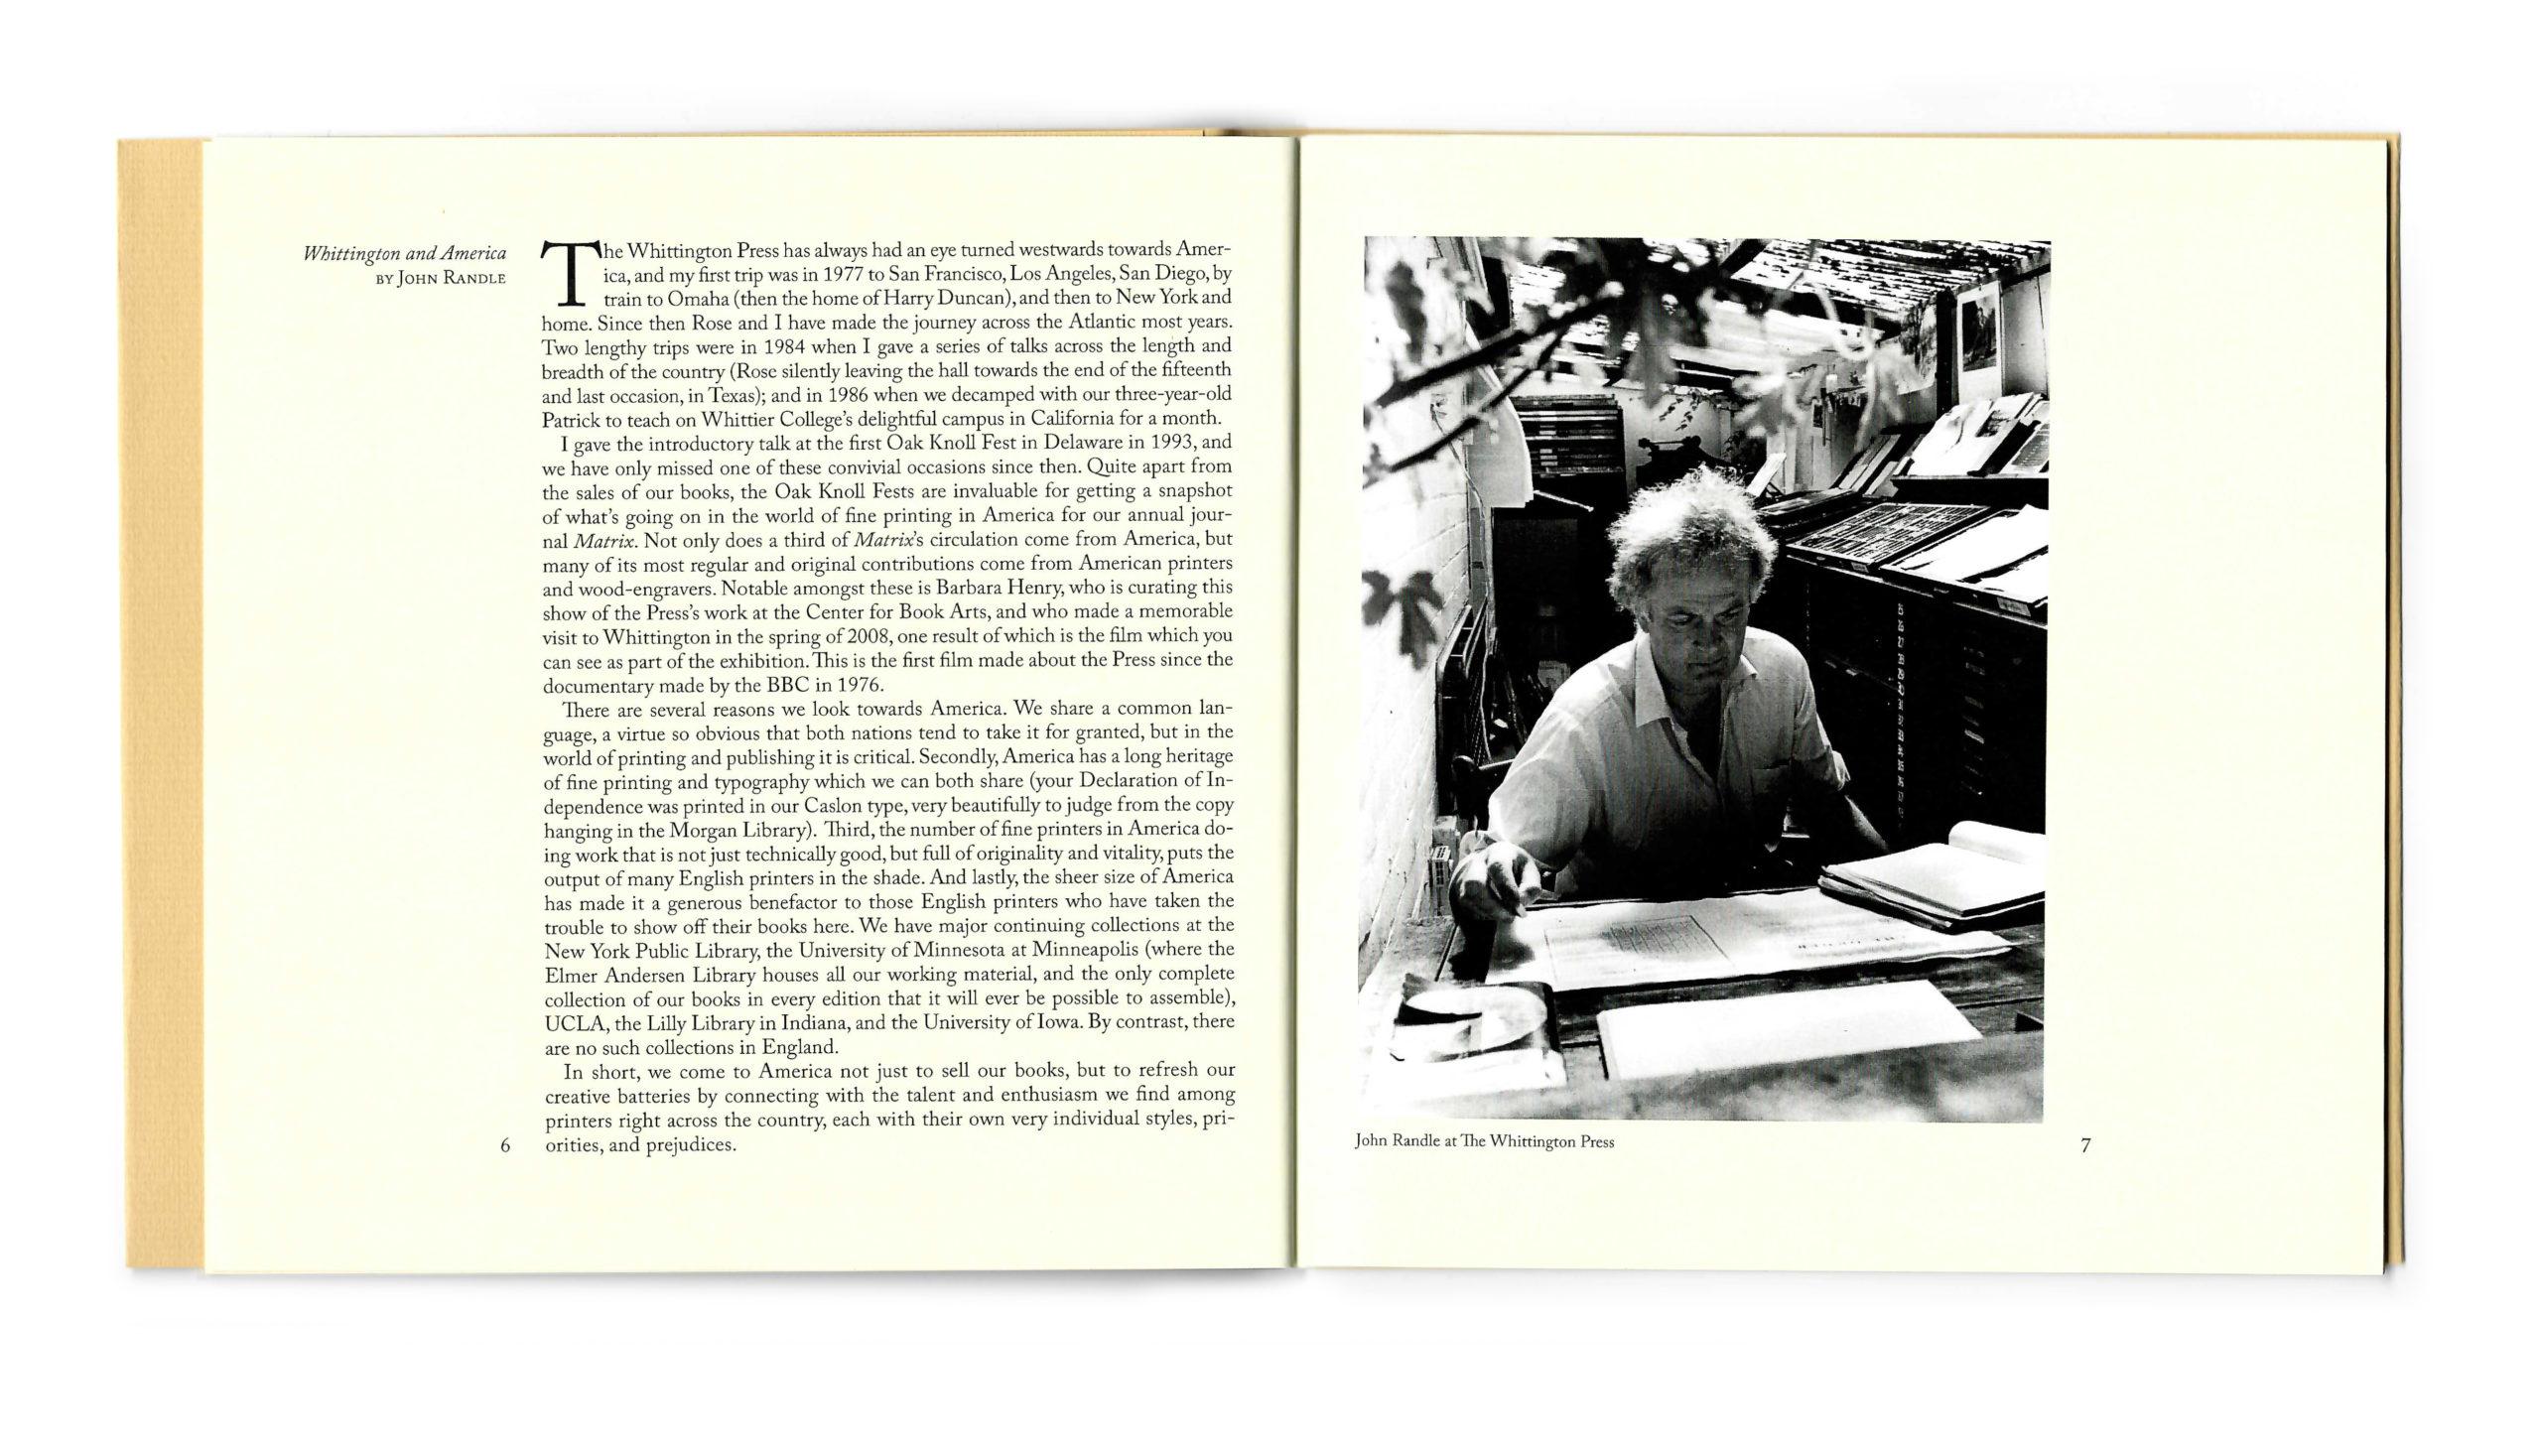 John Randle's essay on whittington press with Image of Jon at the workbench